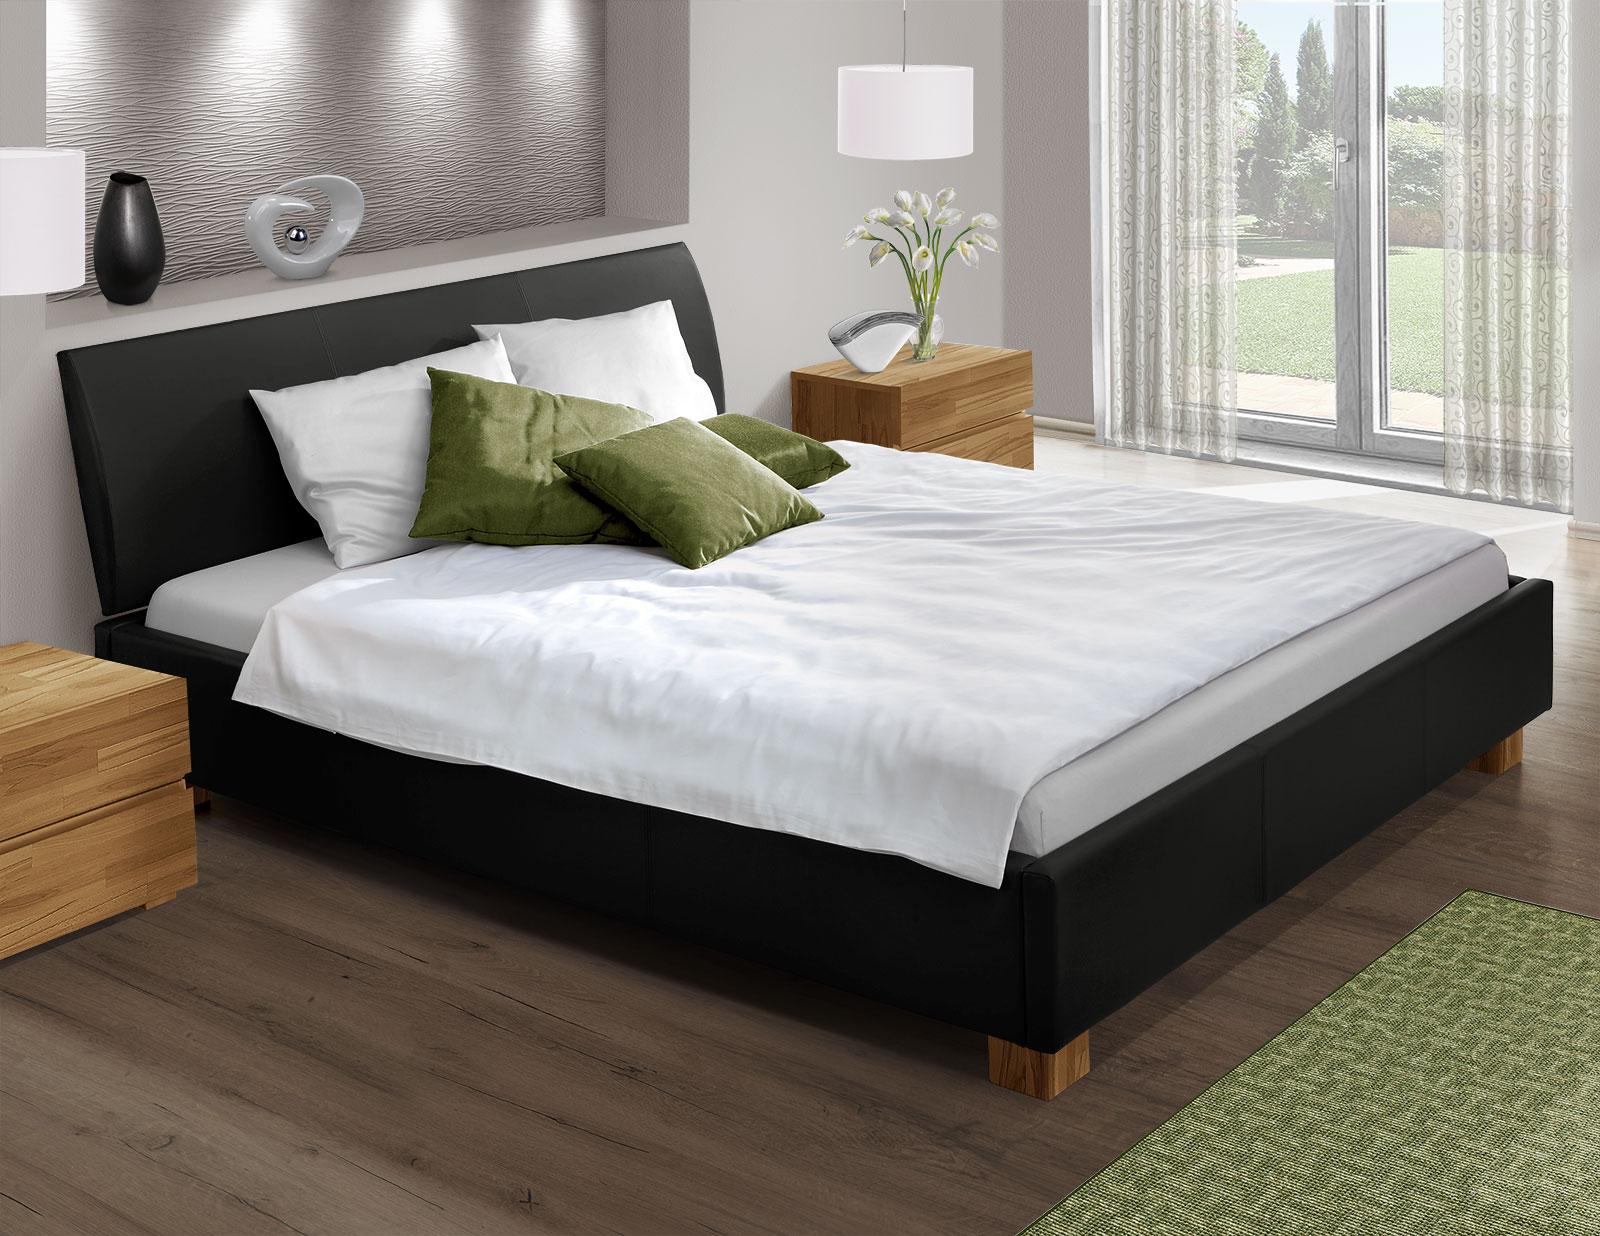 Bett Mit Echtleder Z B In Schwarz 180x200 Cm Serpa